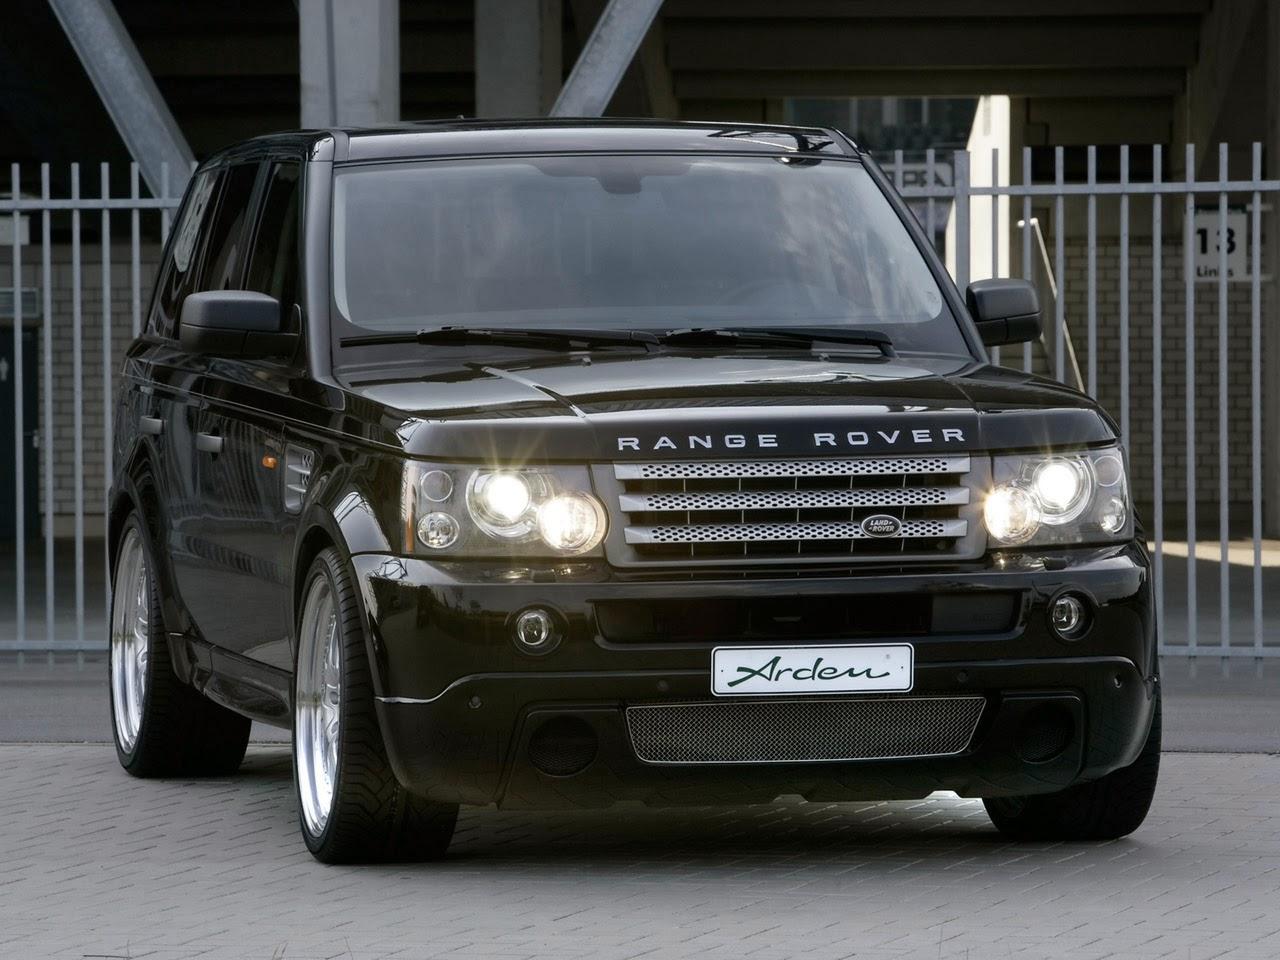 Range-rover-sport-car-spesifikasi-merek-land-rover-model